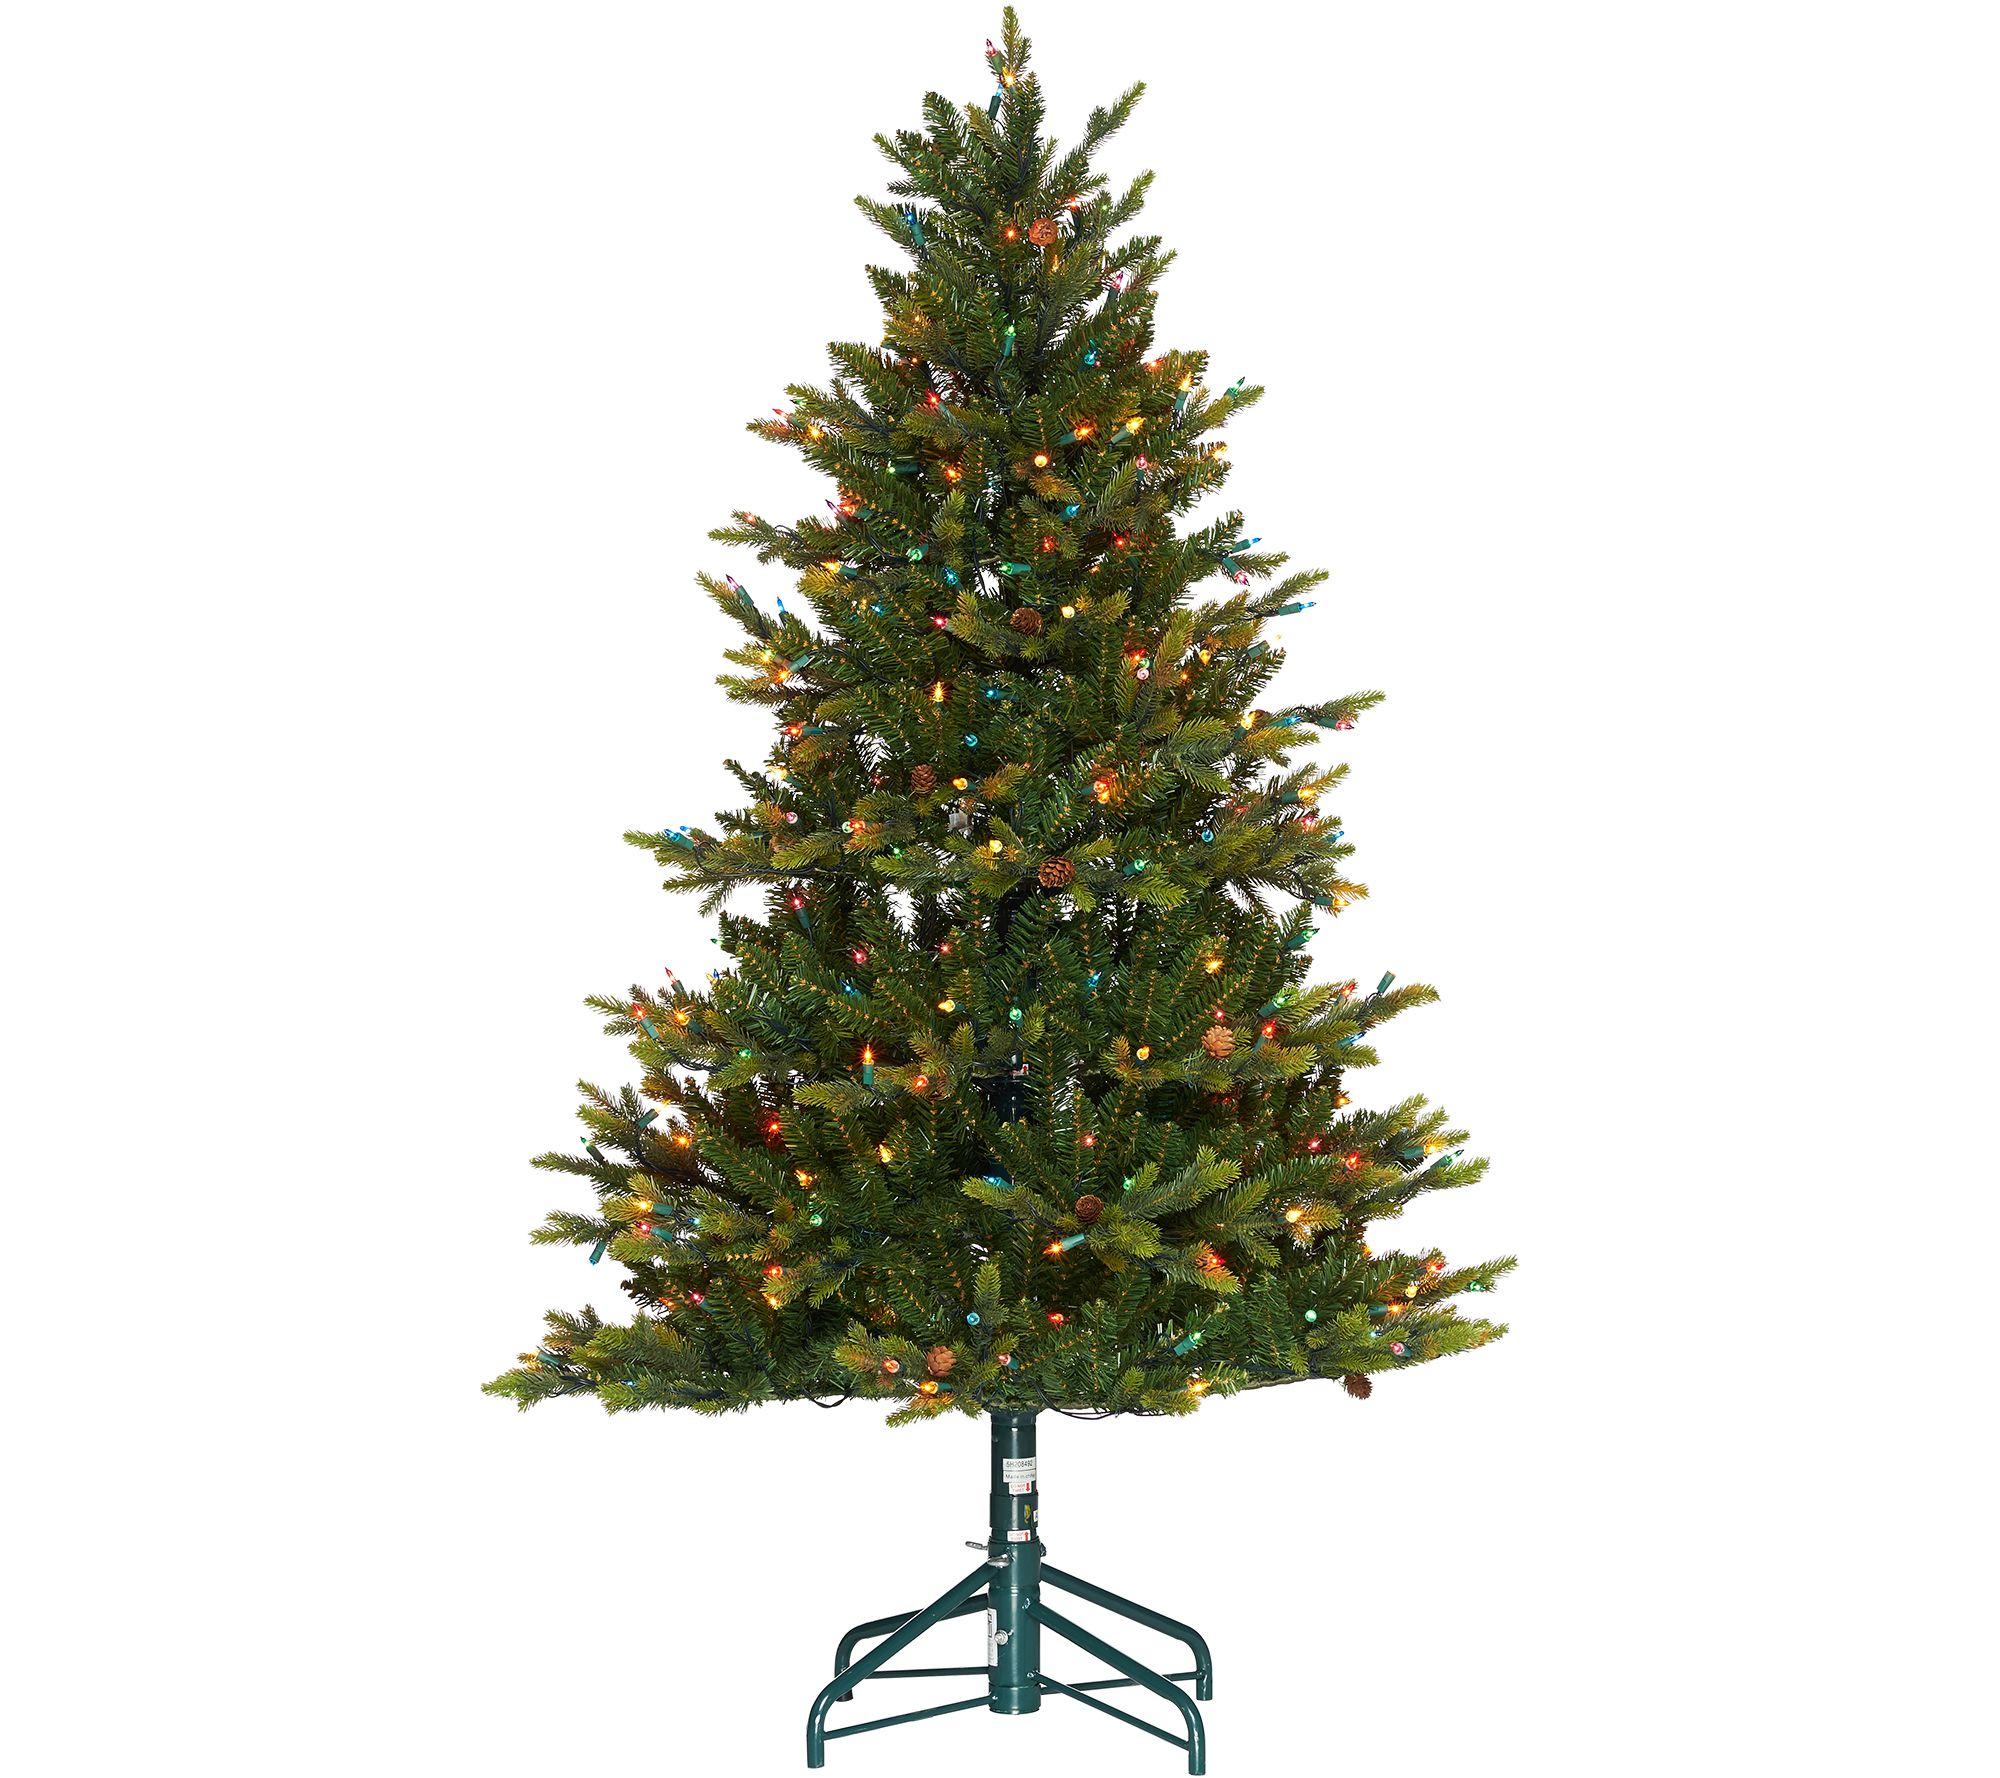 Bethlehem Lights 5' Lancaster Pine Tree With Instant Power